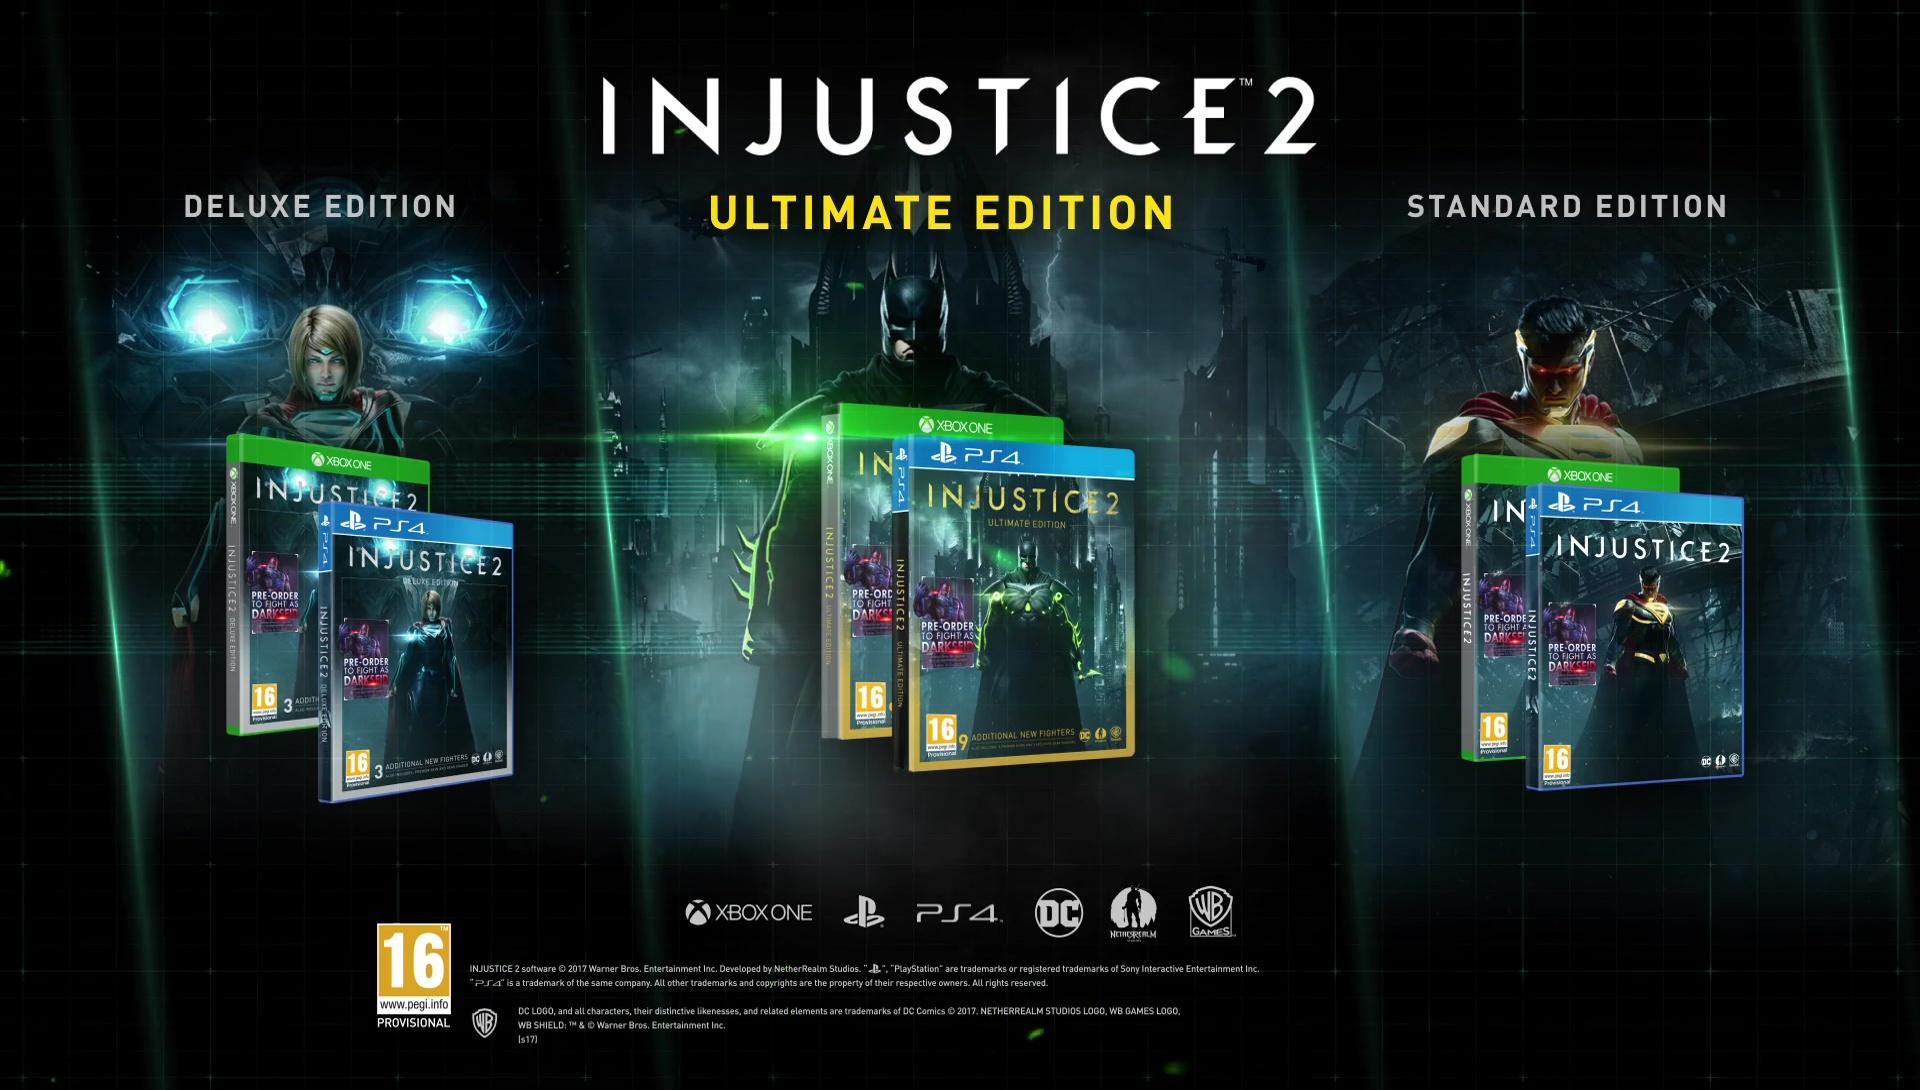 gamestop injustice 2 pre order bonus